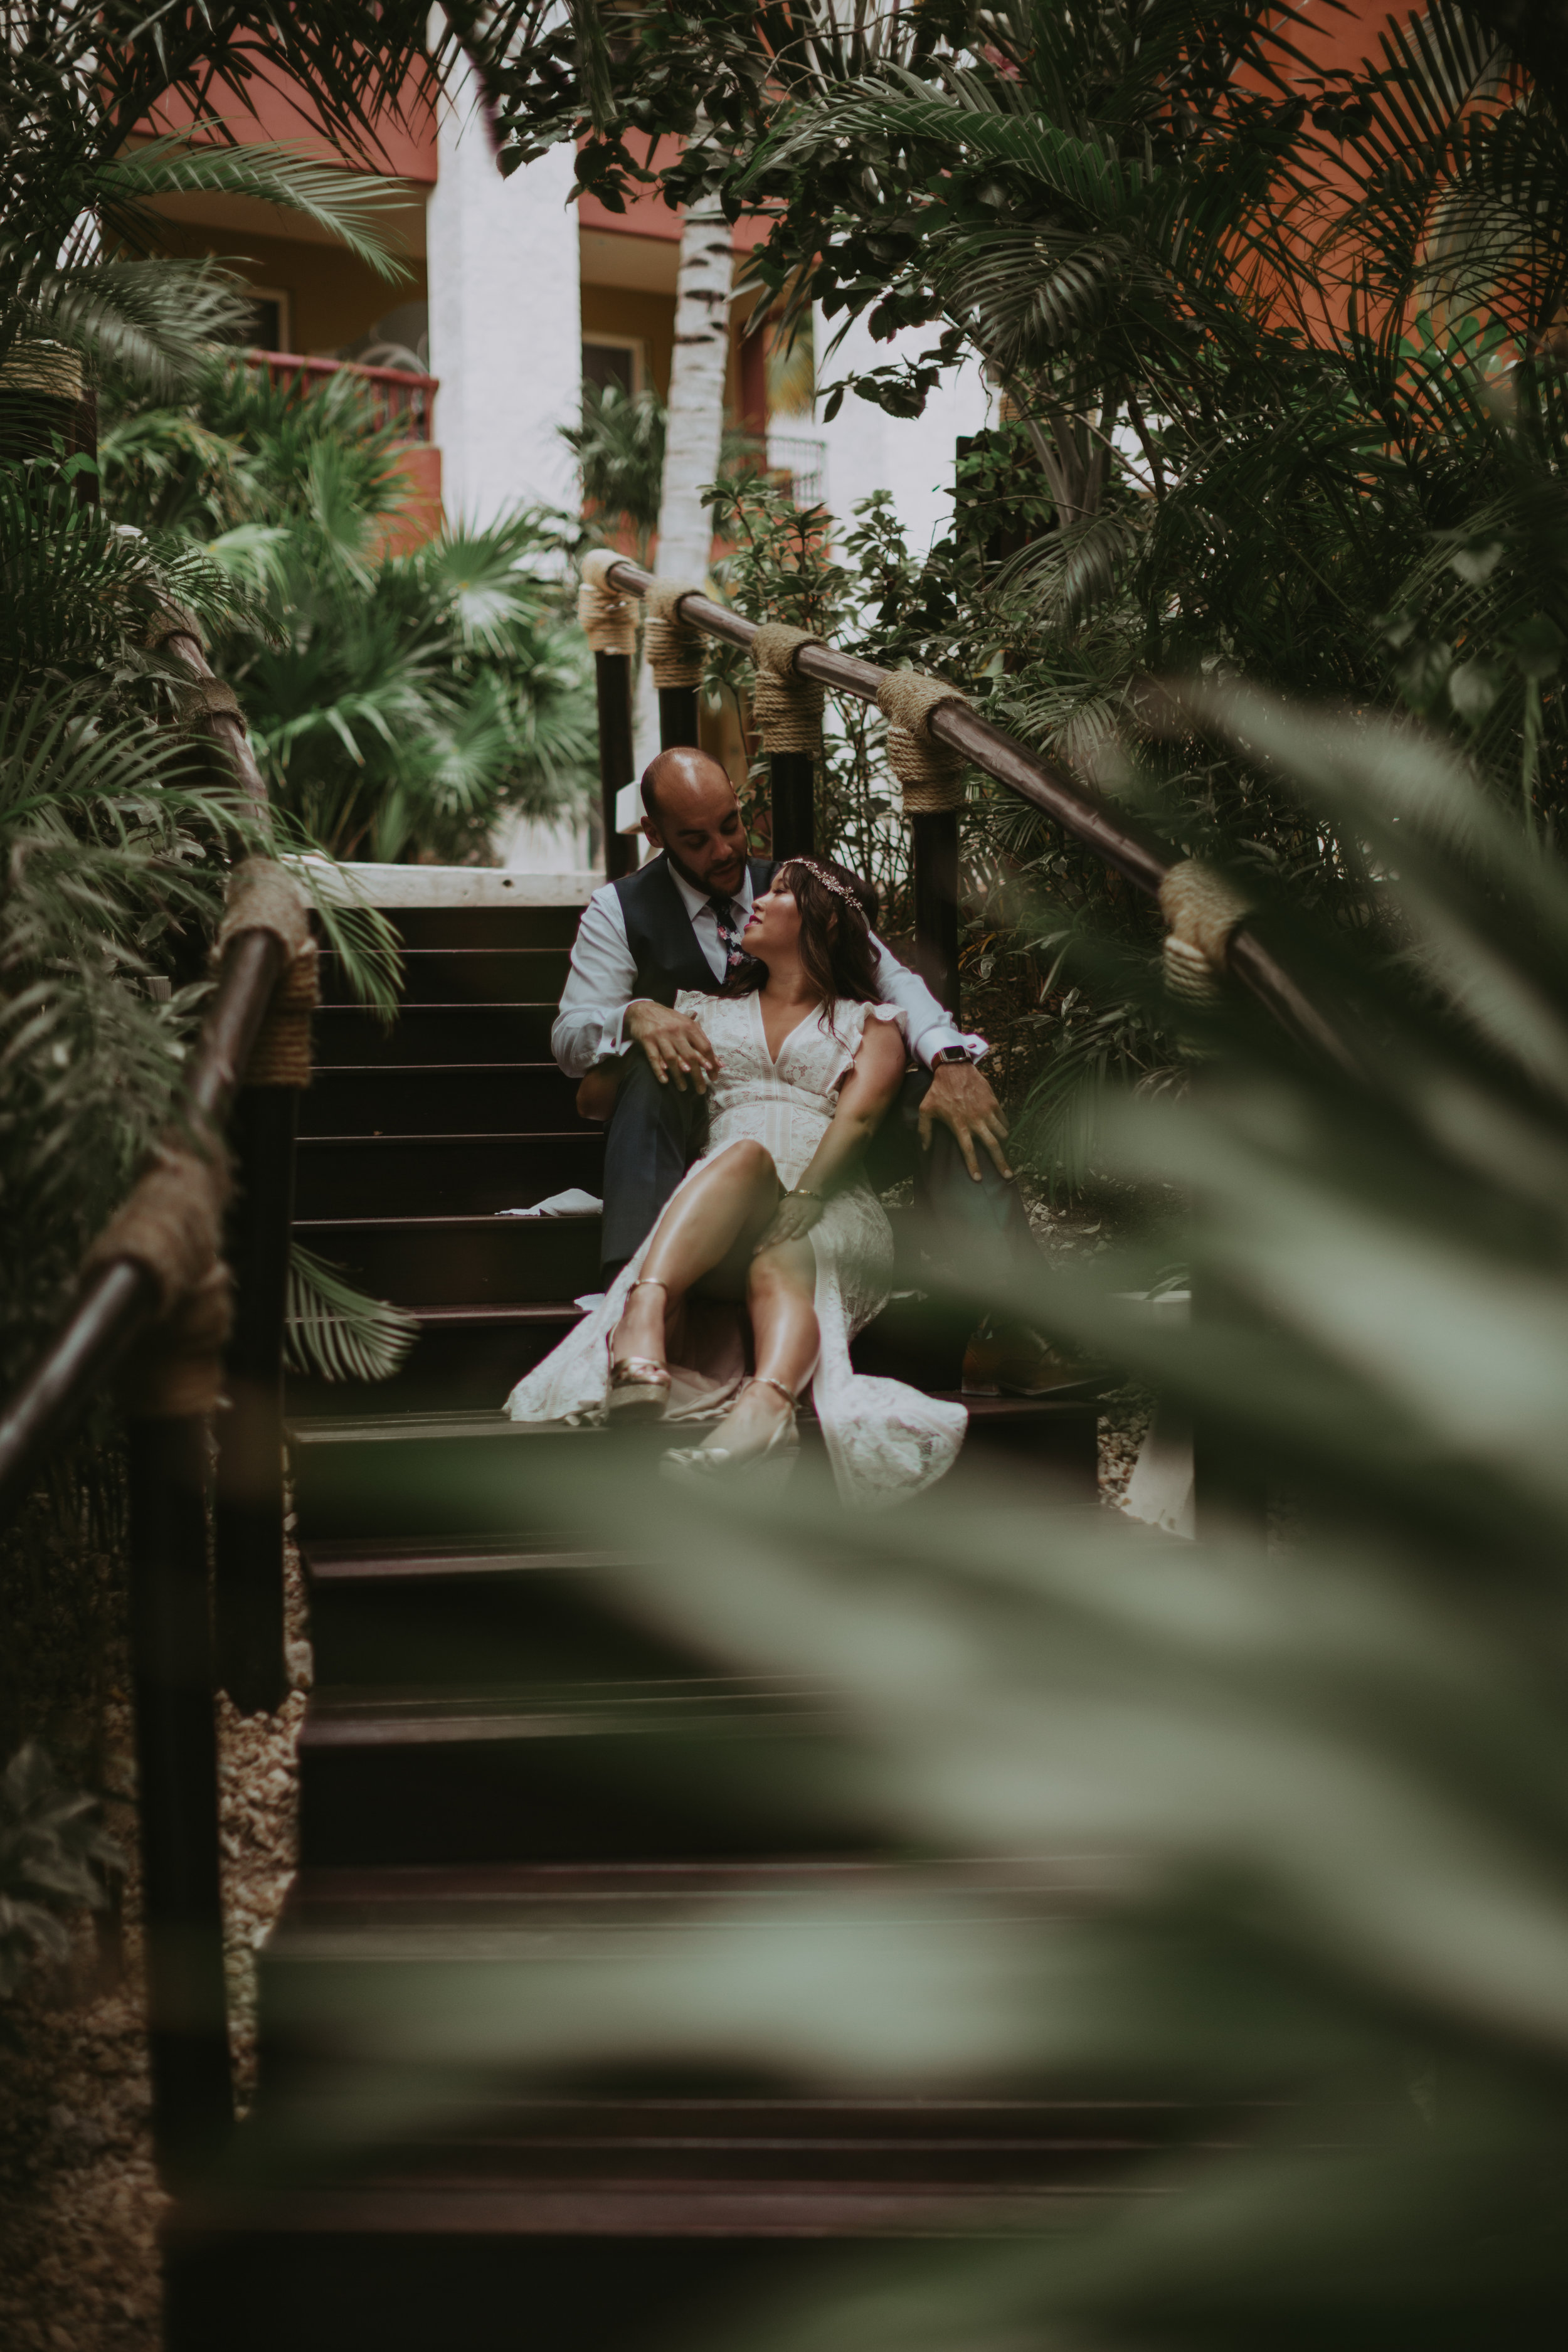 VILLA DEL PALMAR CANCUN WEDDING-THY-BRAN-JENNY CHOK PHOTOIMG_5113.jpg